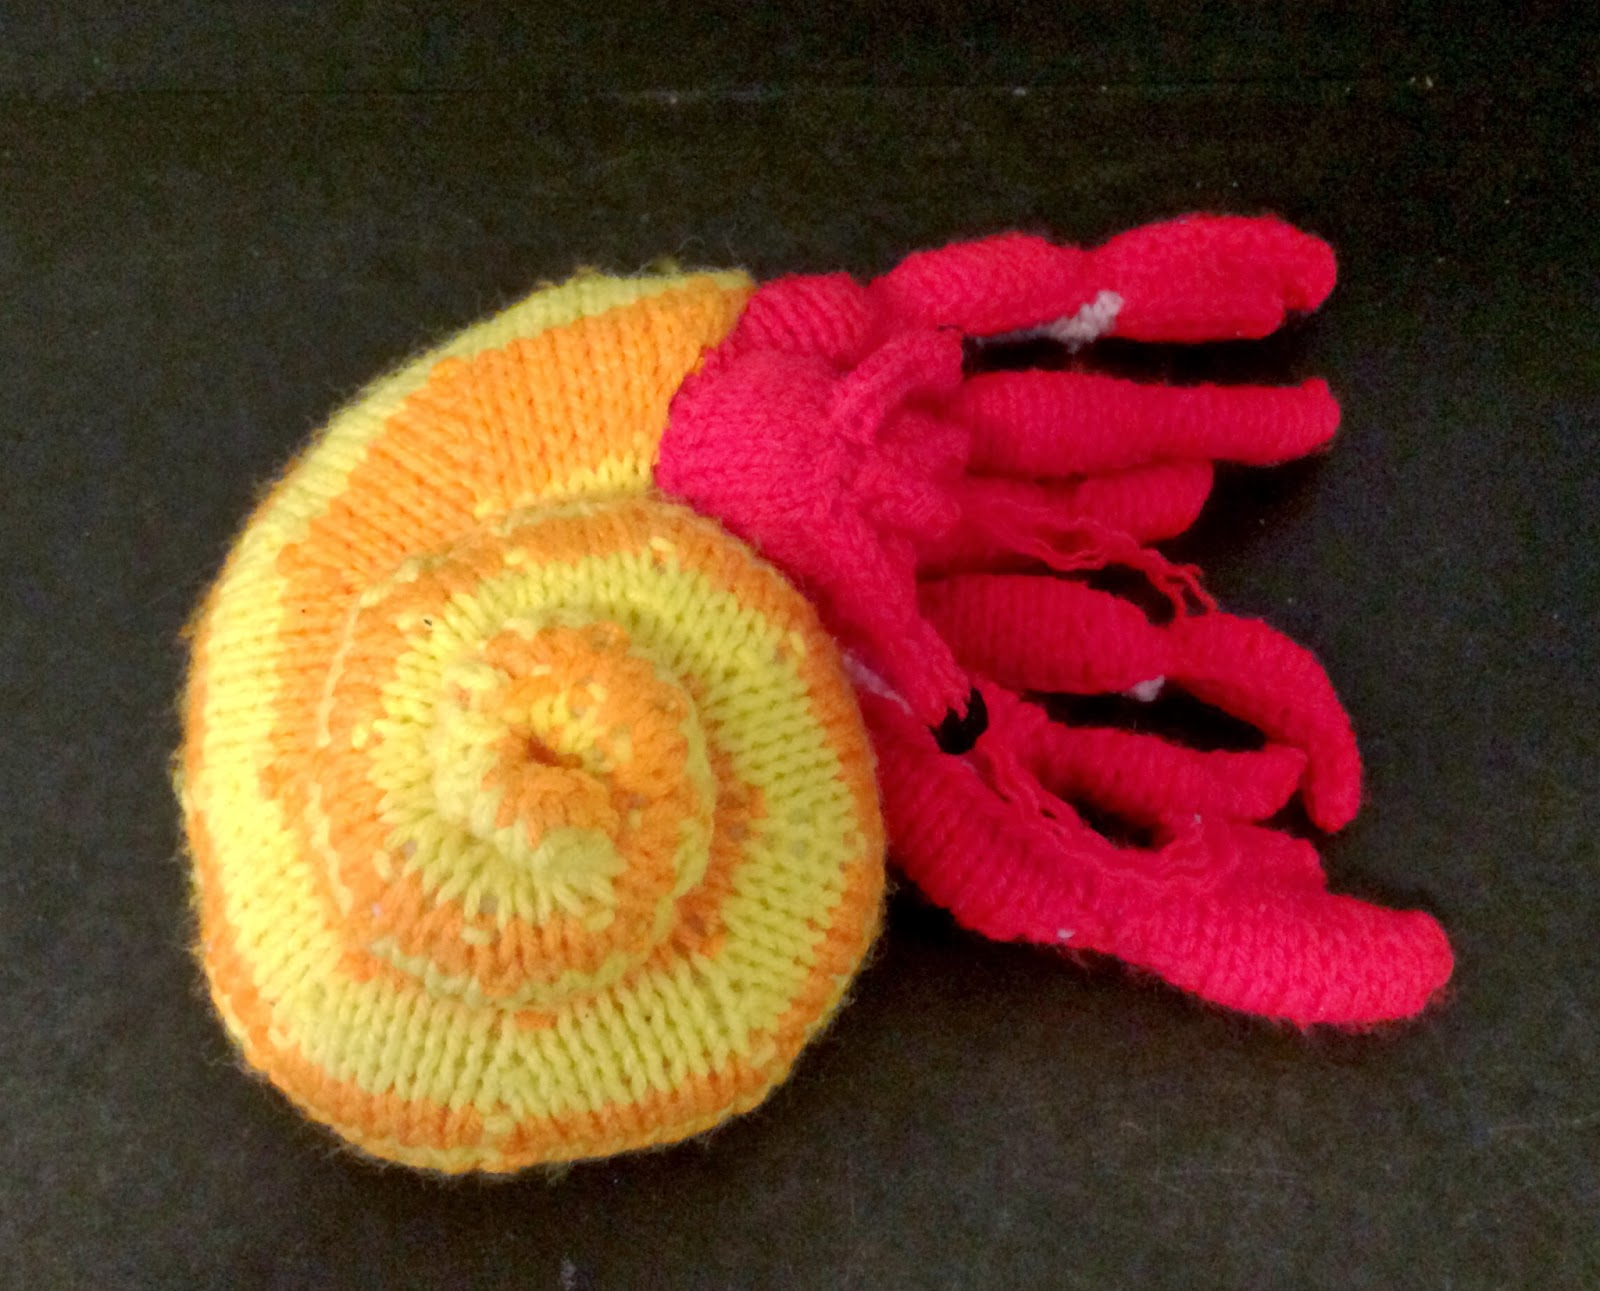 Amigurumi Hermit Crab : Knitskatoon: Amigurumi Animals